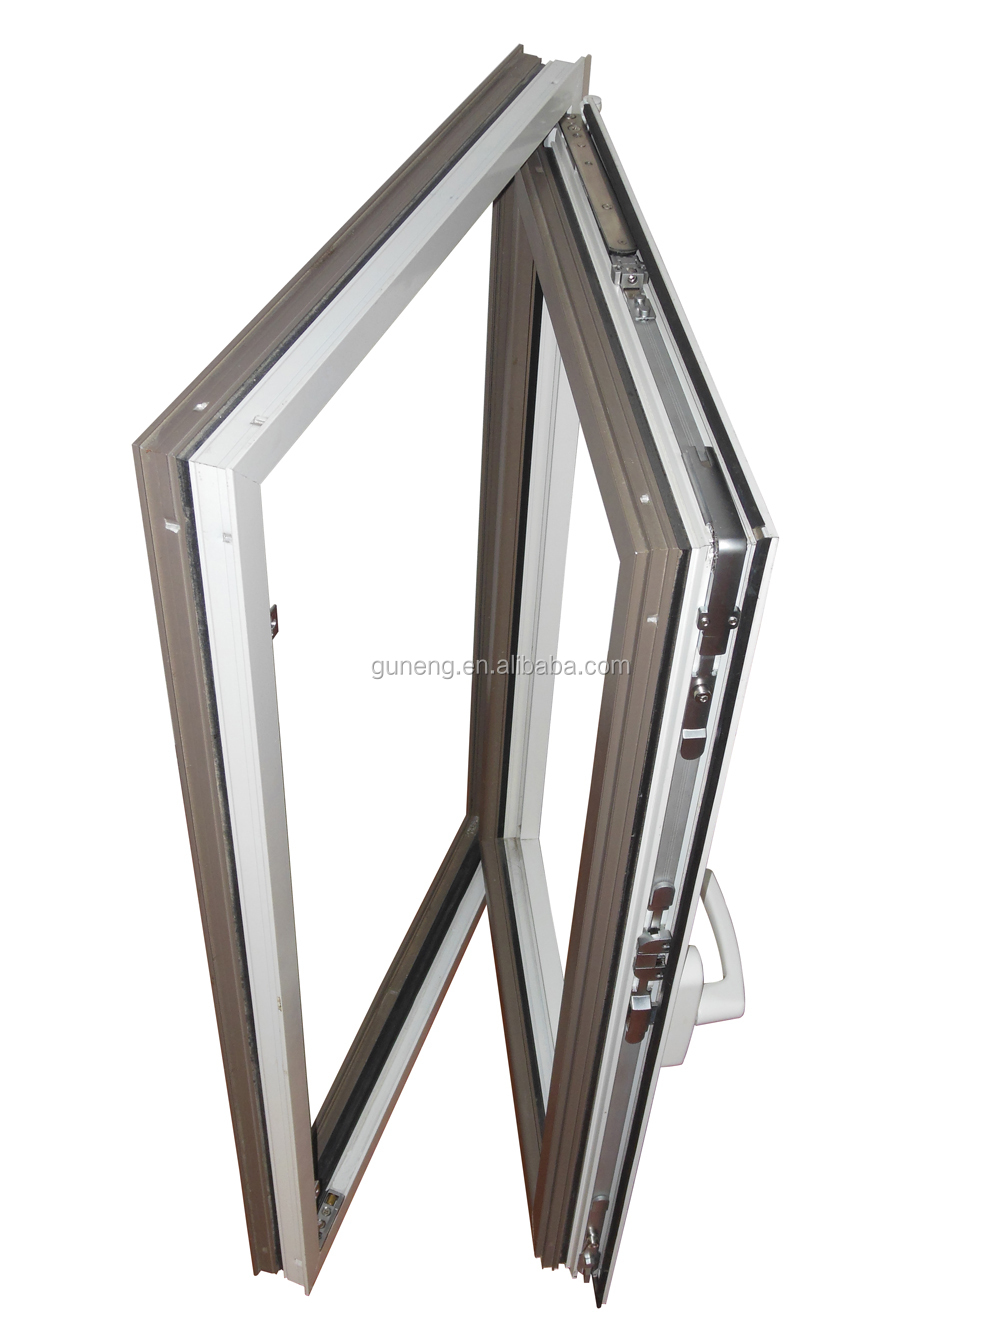 fenster zubeh r aluminium dreh kipp fenster dreh kipp. Black Bedroom Furniture Sets. Home Design Ideas